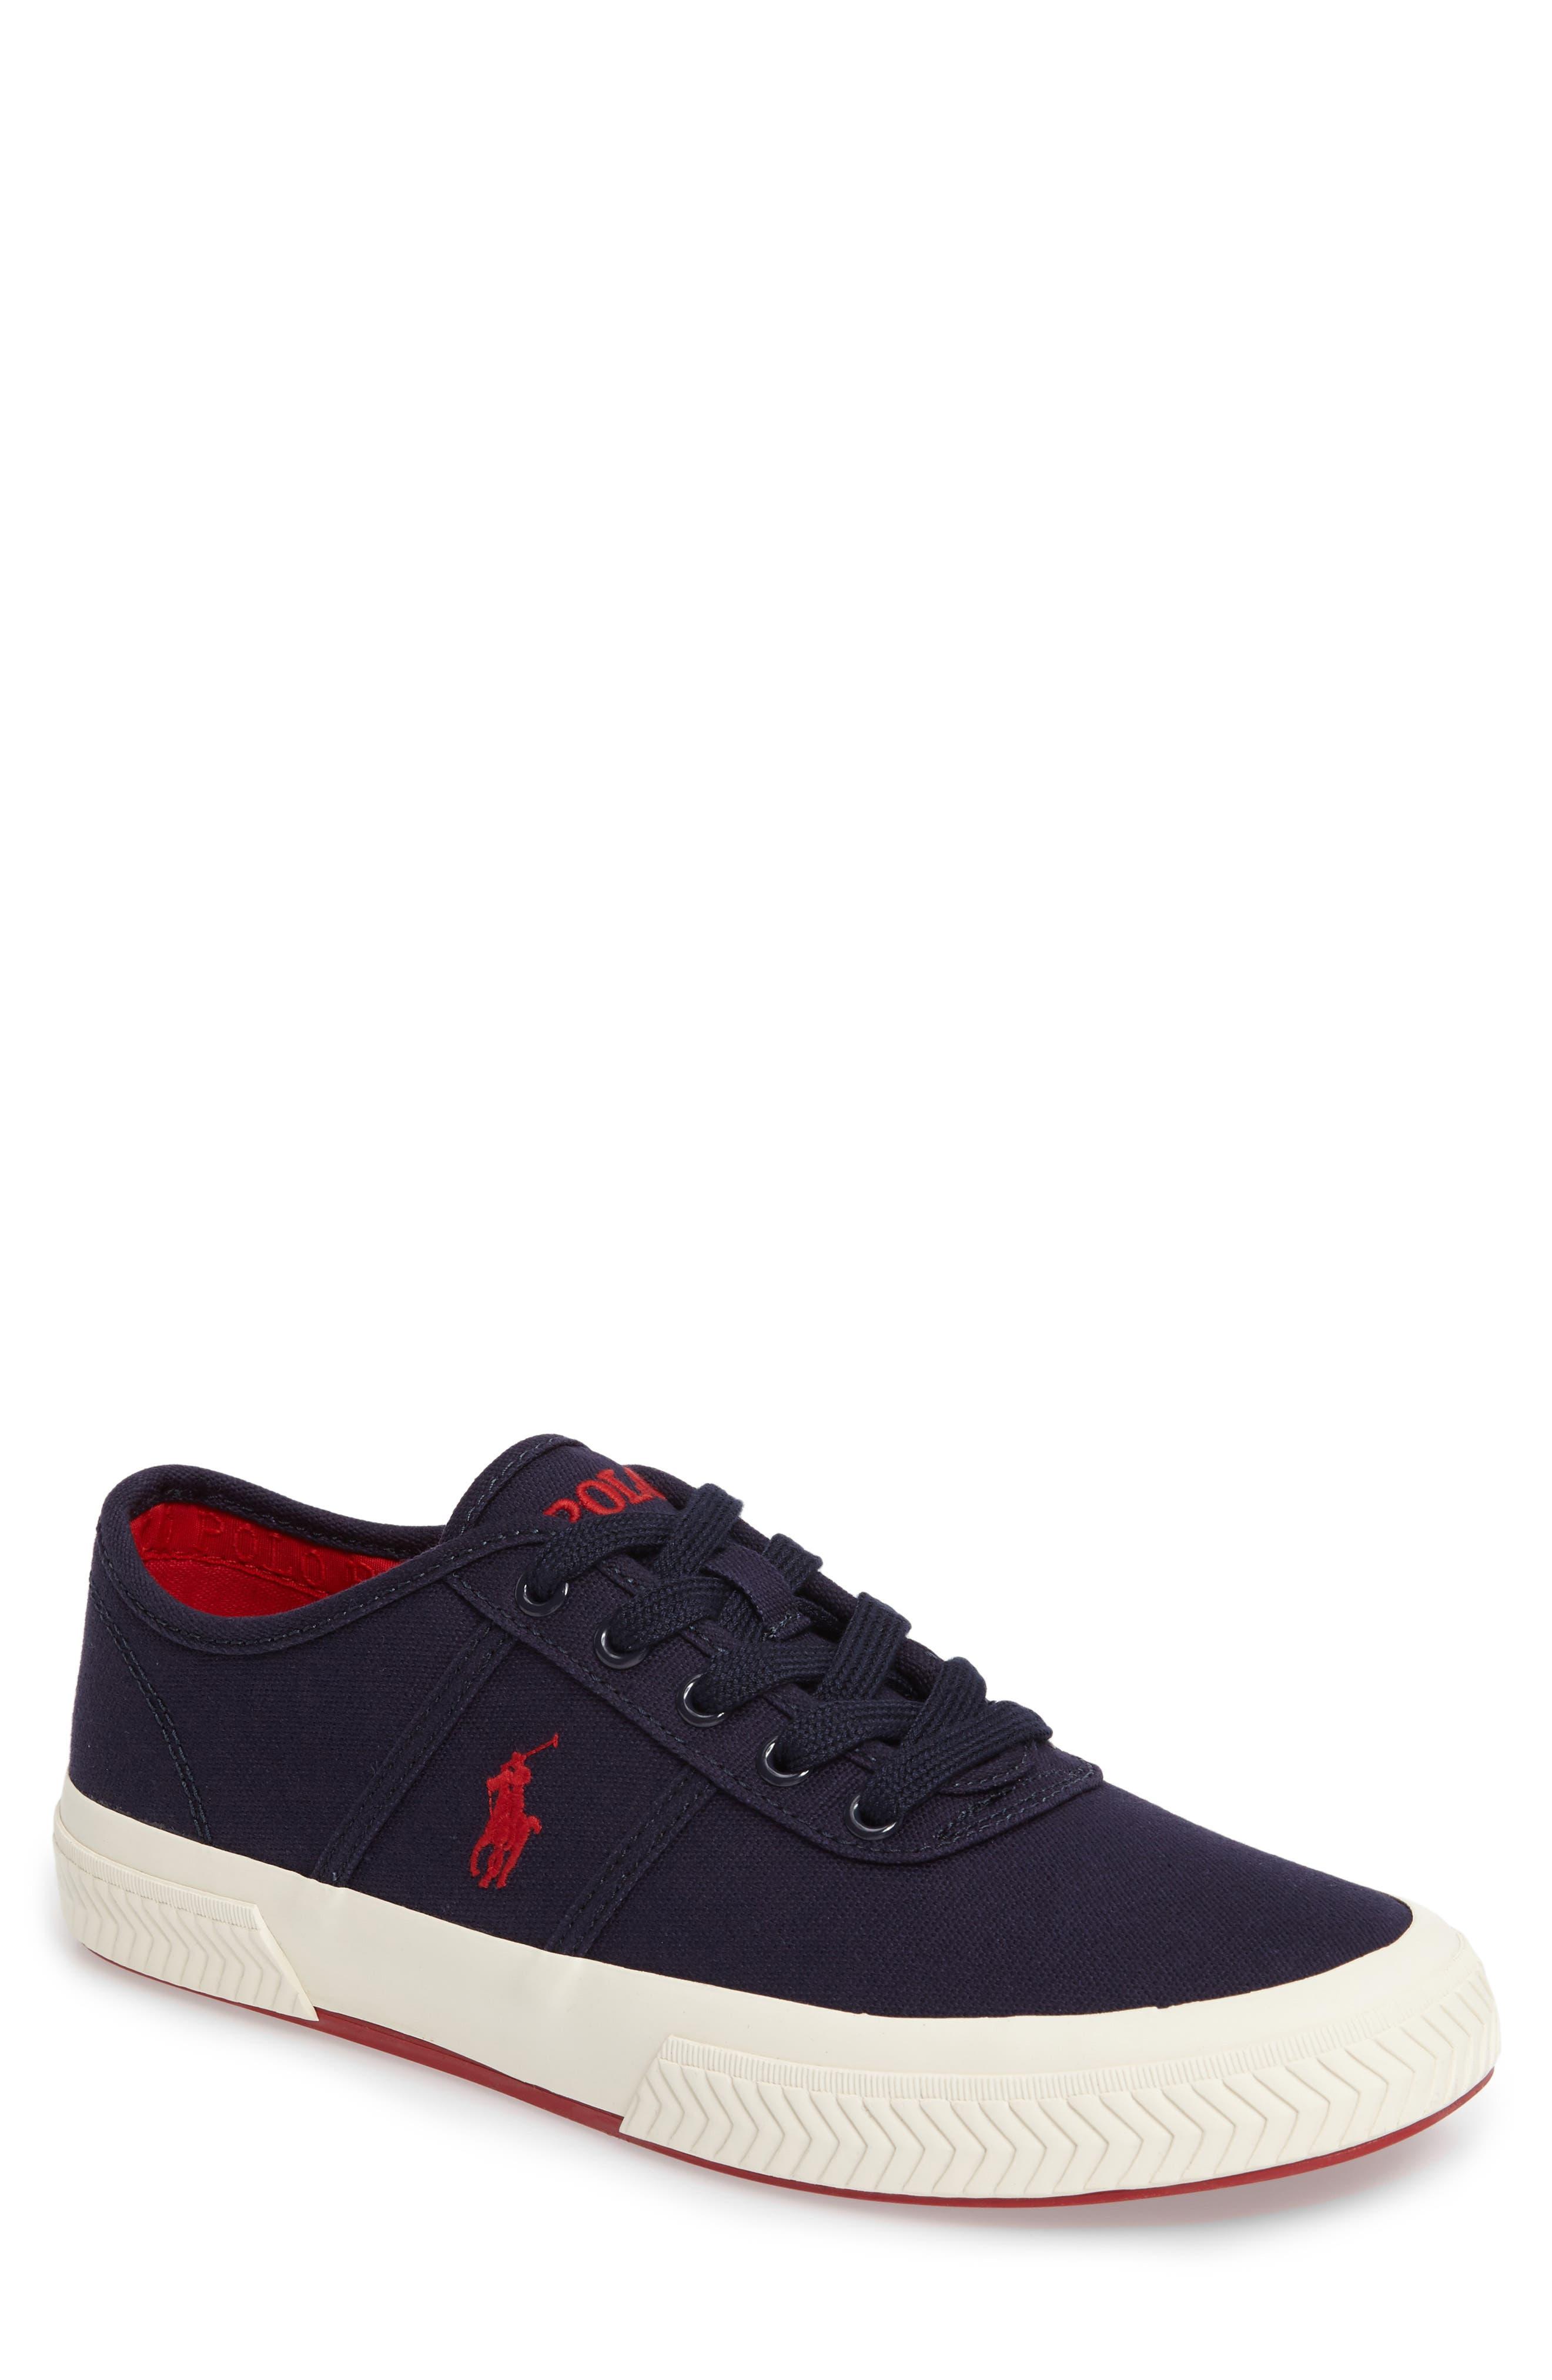 Polo Ralph Lauren Tyrian Sneaker,                         Main,                         color, 410